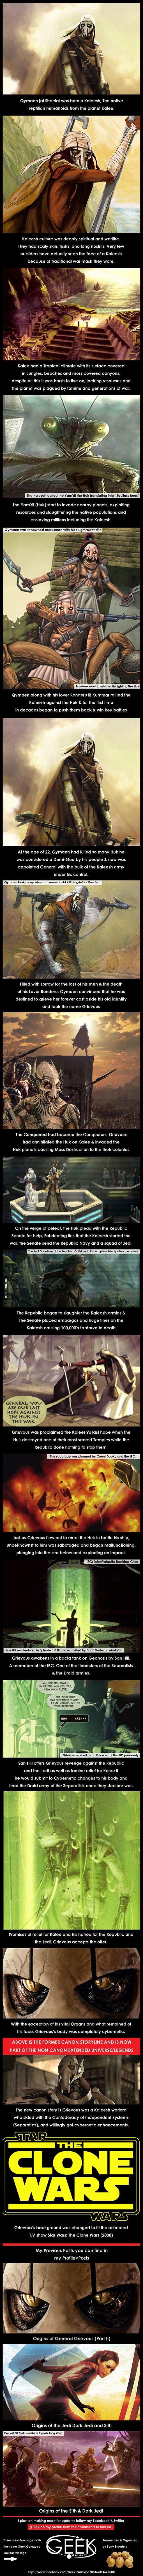 Origins of General Grievous (Part I) Star Wars History. - 9GAG